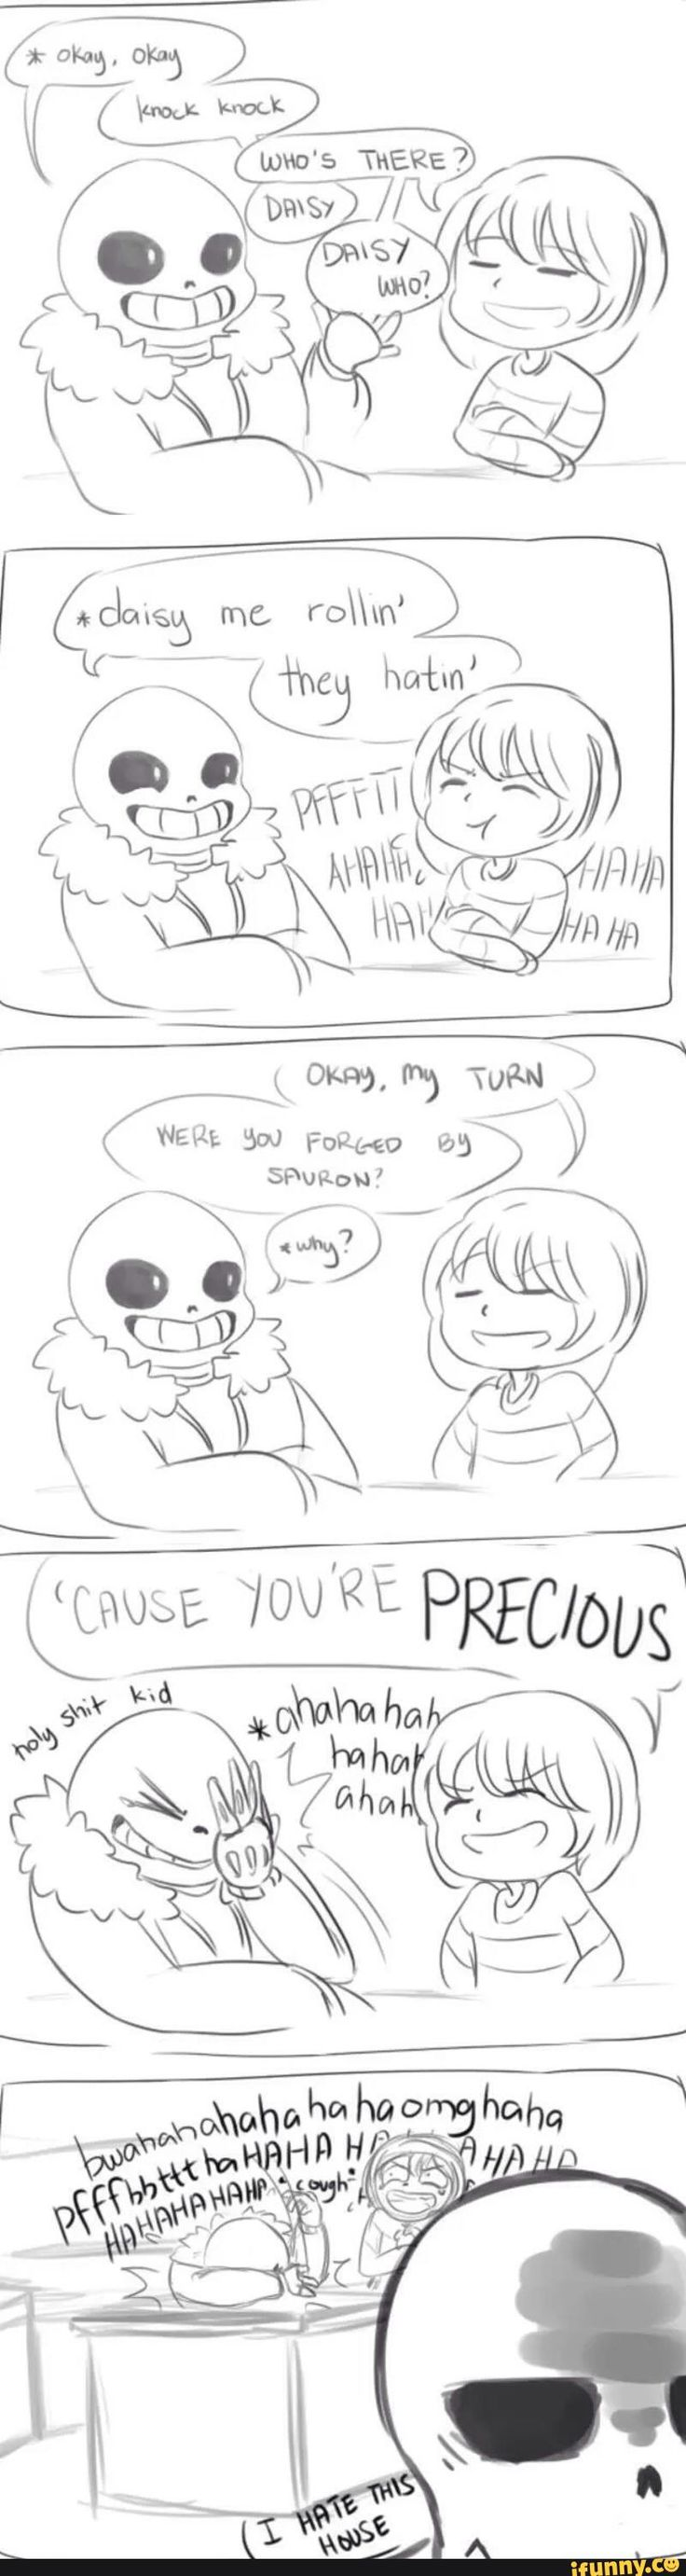 papyrus, sans, frisk, undertale || ME i would groan for puns but i would make puns that would make your life cringe